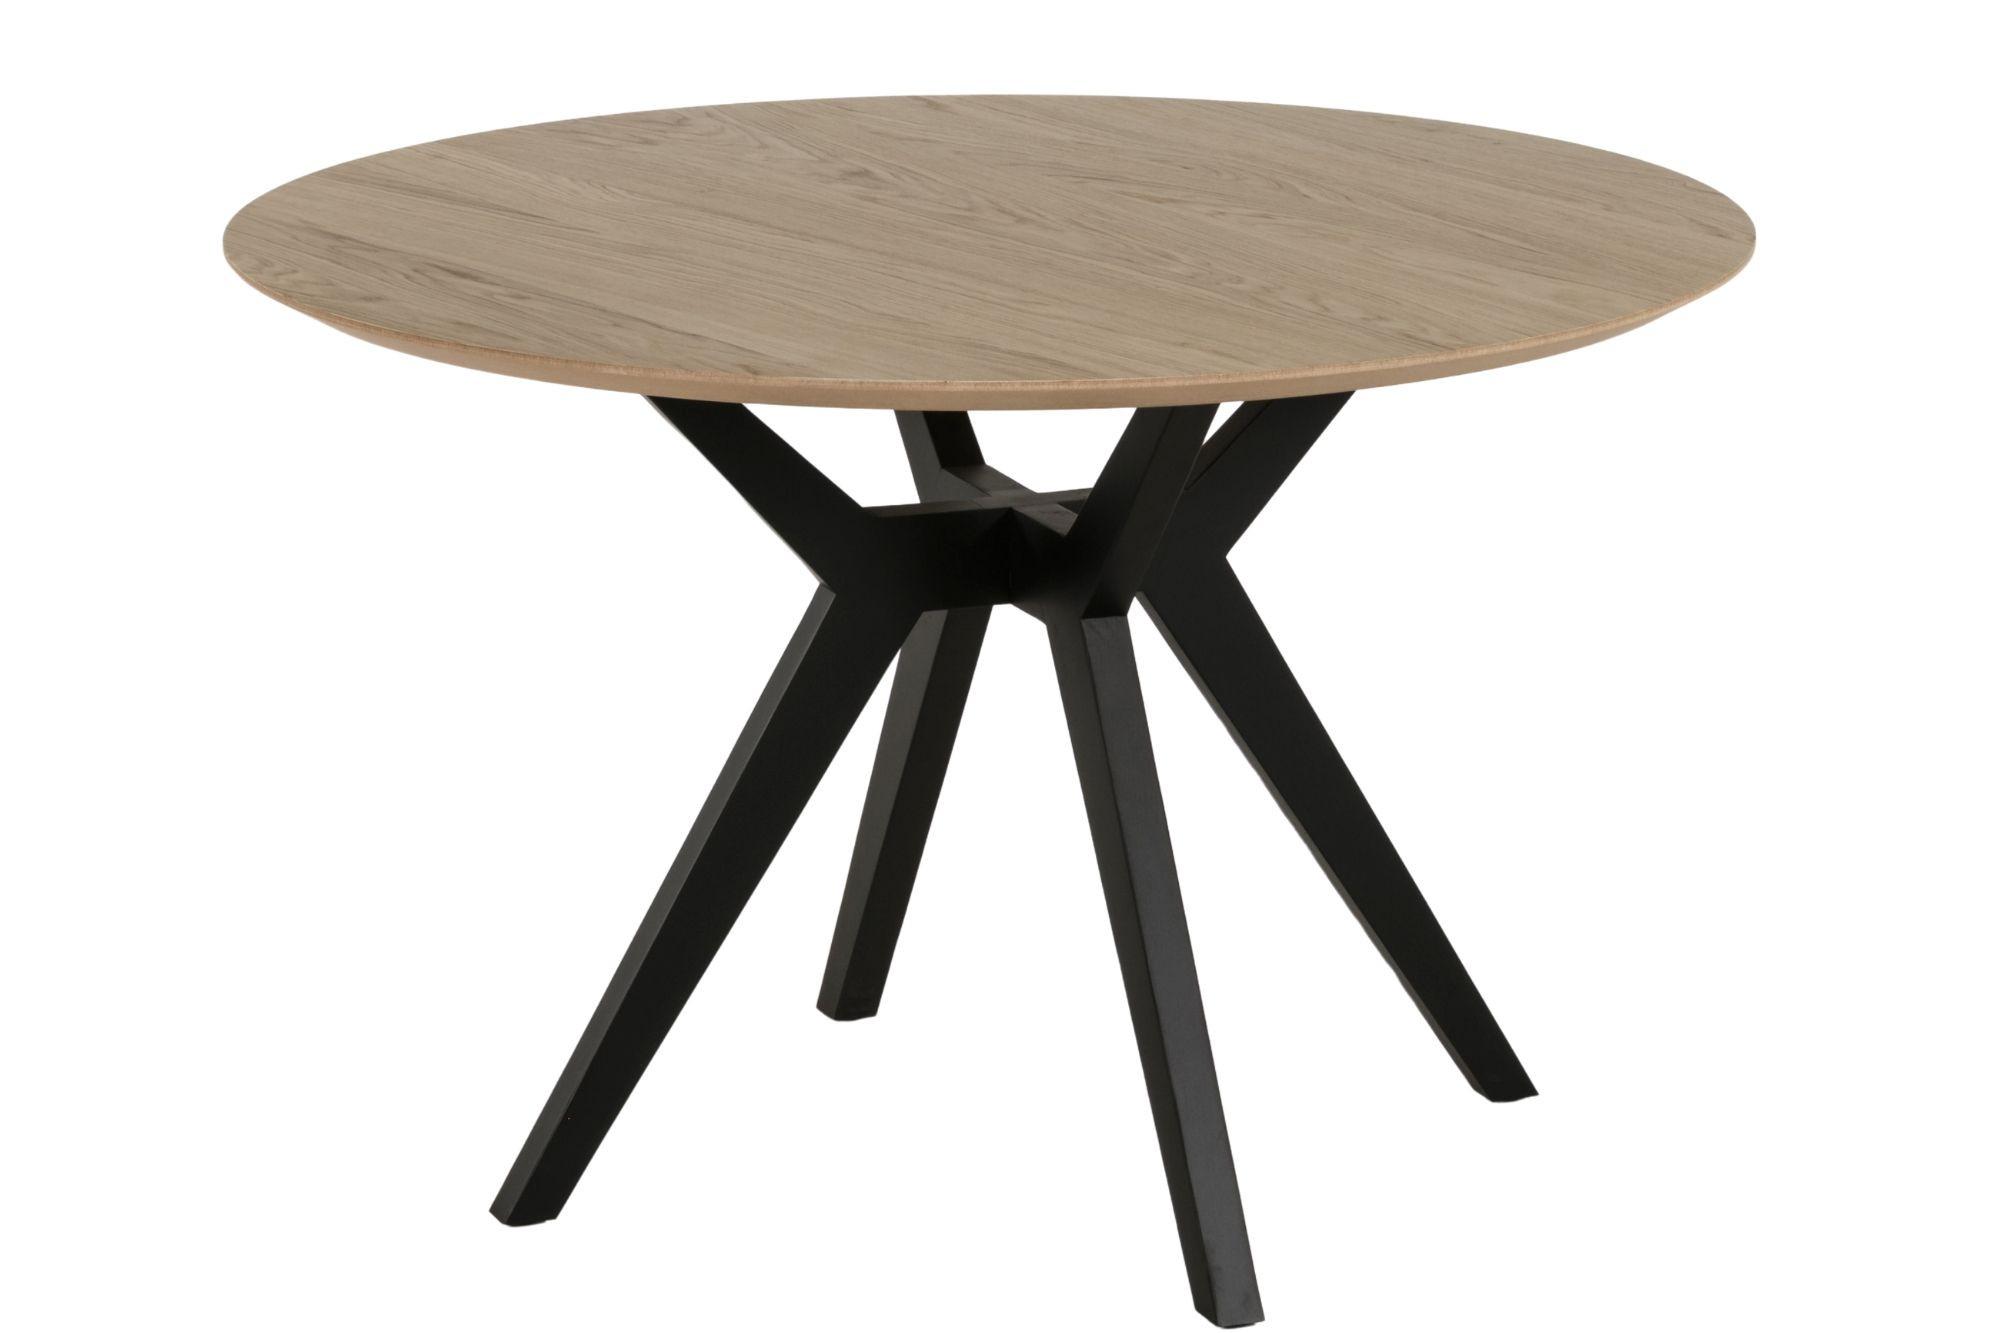 table ronde en bois, table en bois ronde, table ronde bois